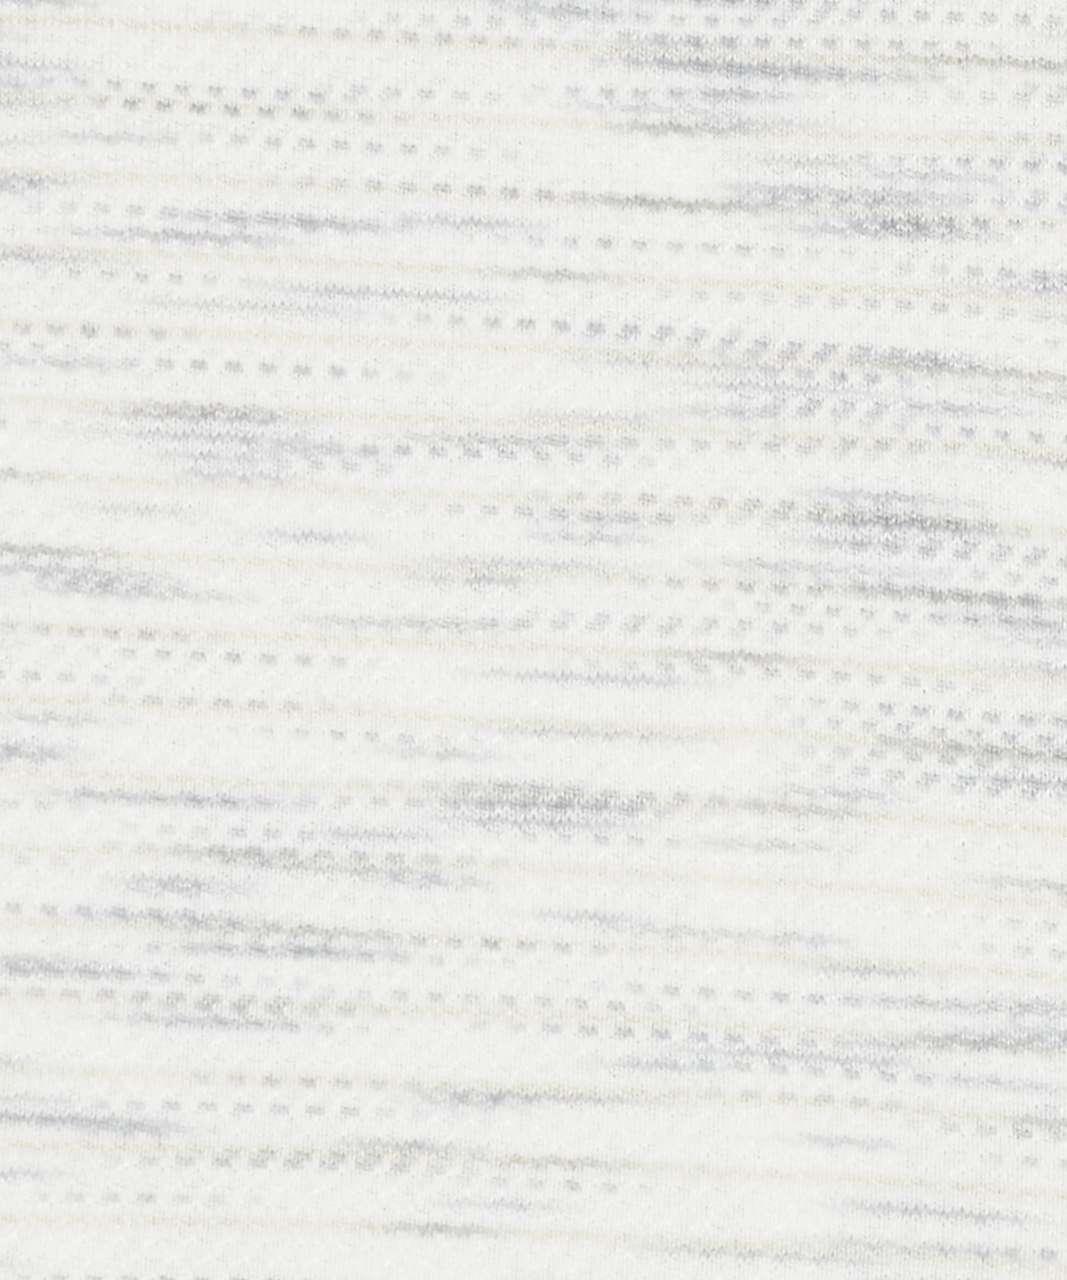 Lululemon Essential Tank - Tiger Space Dye Hail White